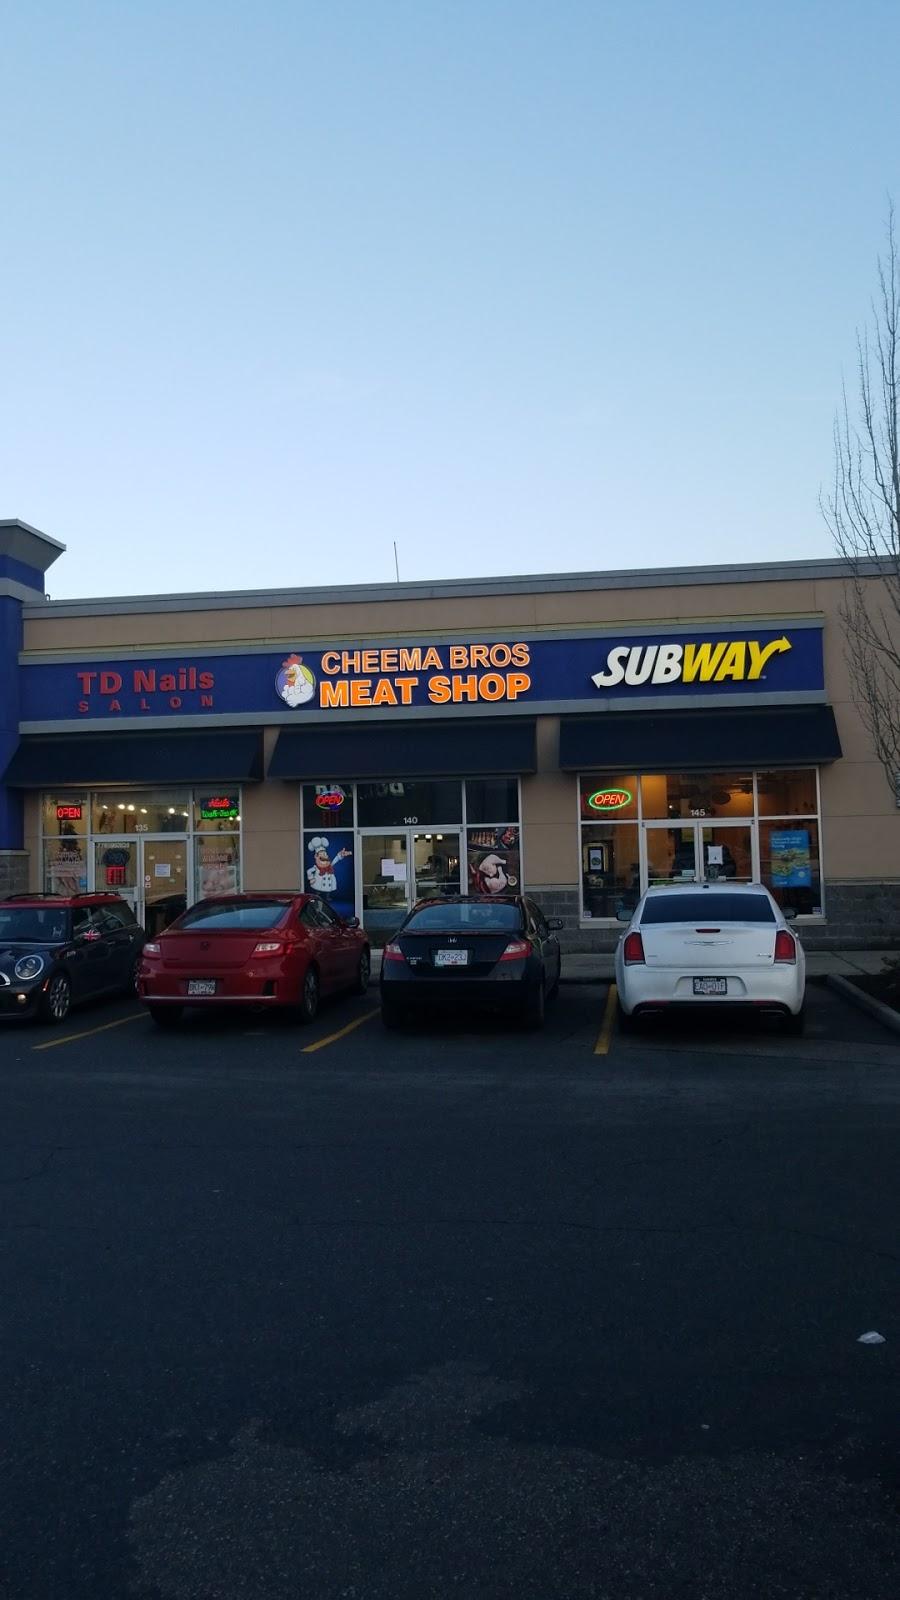 Cheema Bros. Meat Shop | store | 12477 88 Ave #140, Surrey, BC V3W 1P8, Canada | 6045932220 OR +1 604-593-2220